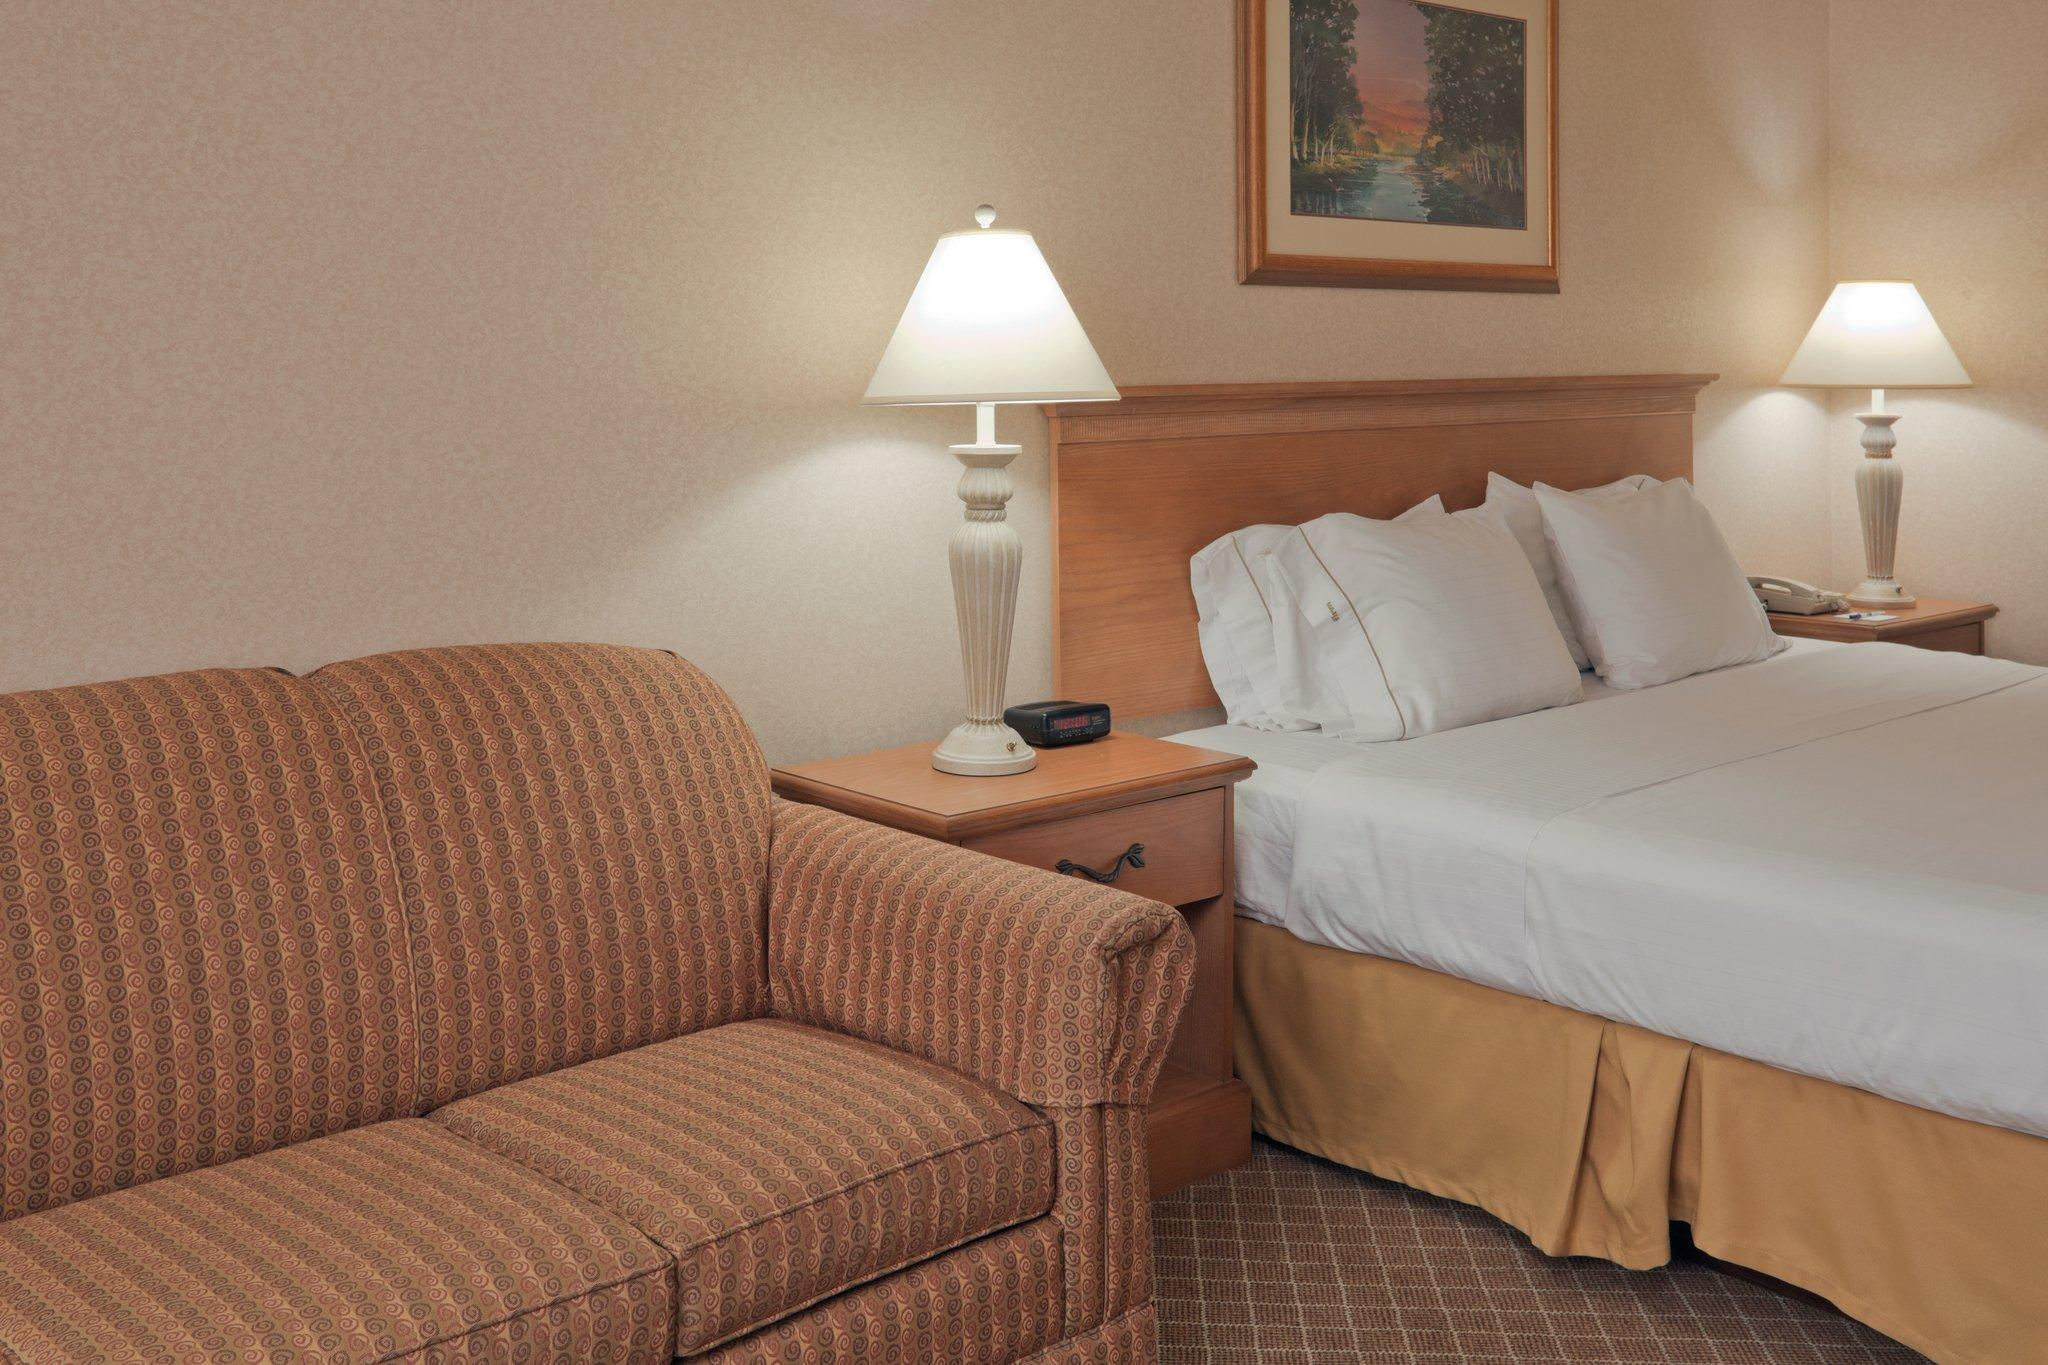 Holiday Inn Express Perrysburg